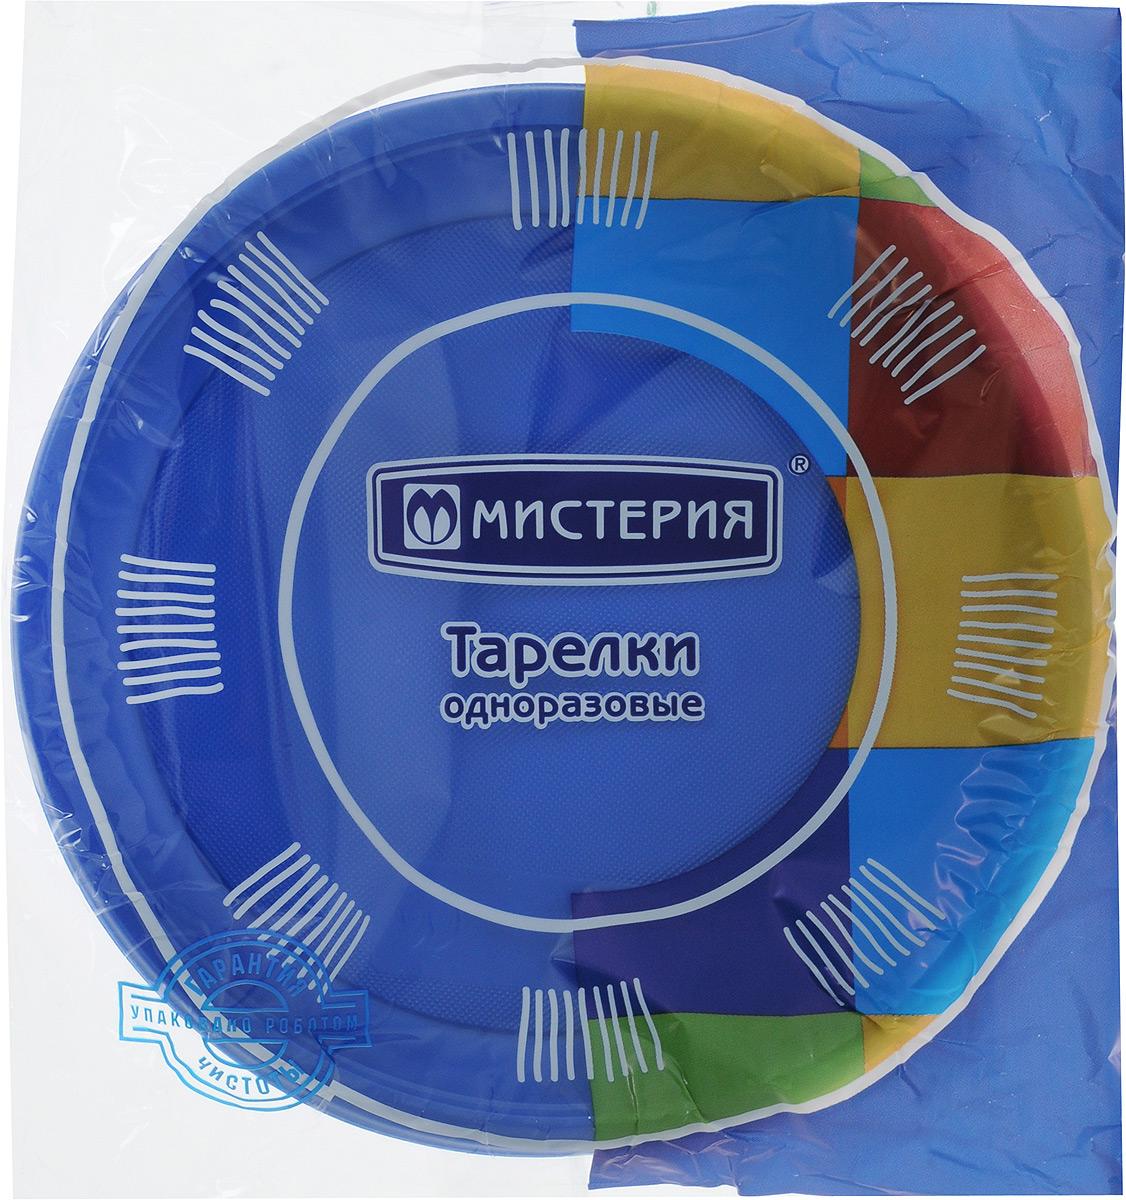 "Набор одноразовых тарелок ""Мистерия"", цвет: синий, диаметр 21 см, 12 шт. 183220"